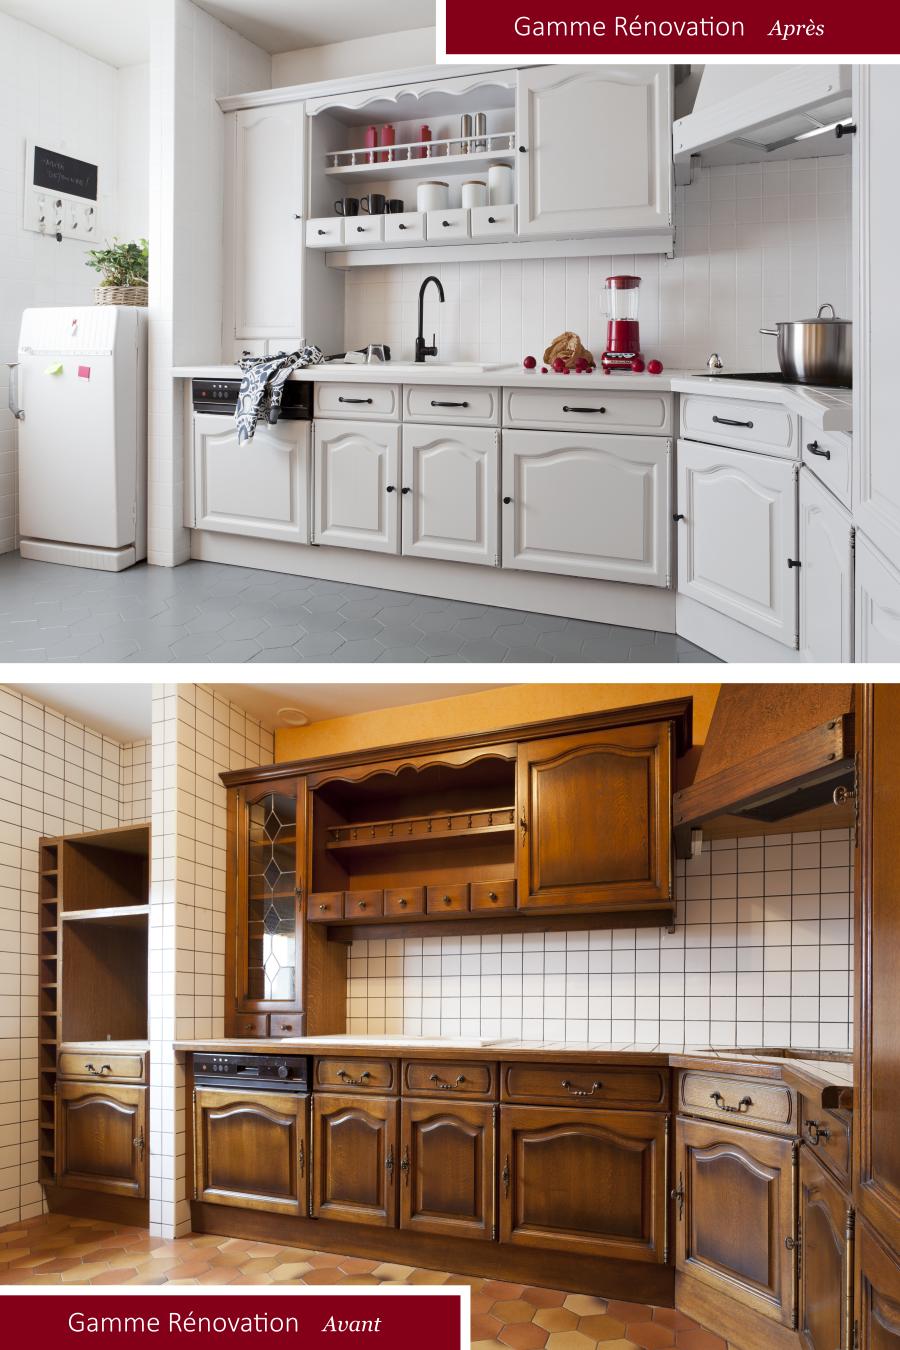 Renover L Integralite De Votre Cuisine Avec Les Peintures De La Gamme Renovation V33 V33 Renovation Meuble Cuisine Peinture Meuble Cuisine Renovation Cuisine